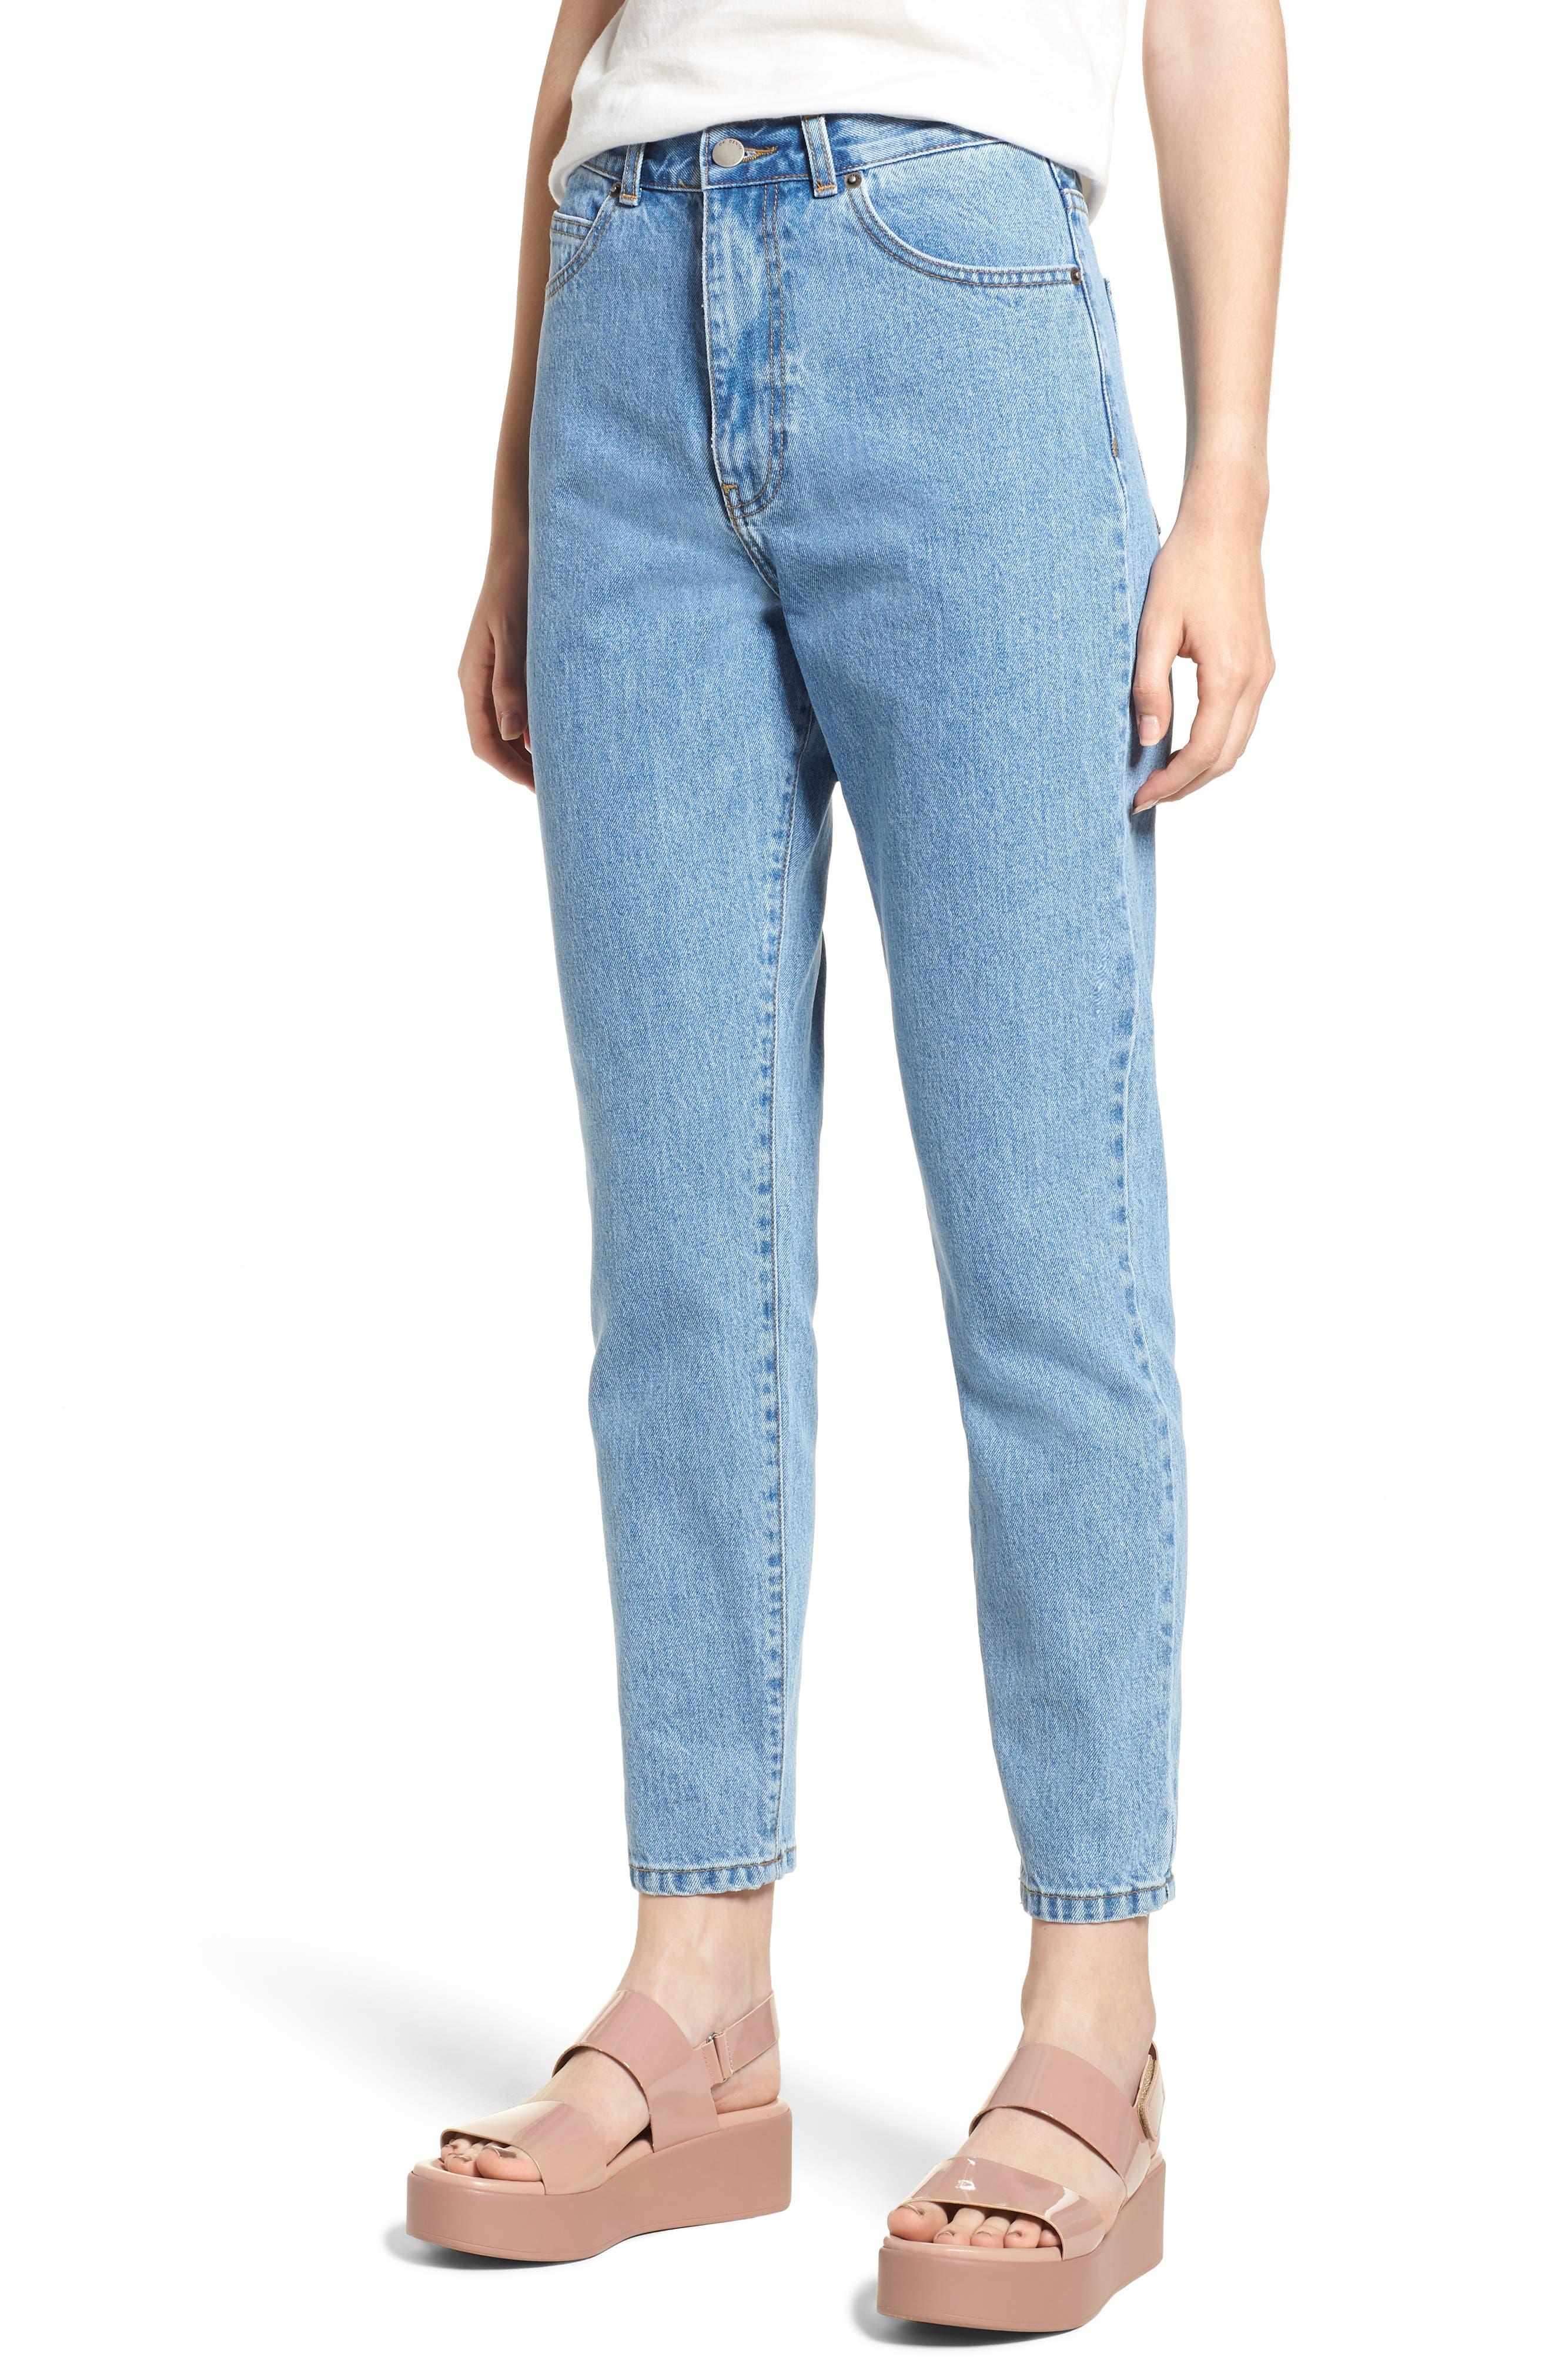 Nora Mom Jeans,                             Main thumbnail 1, color,                             400